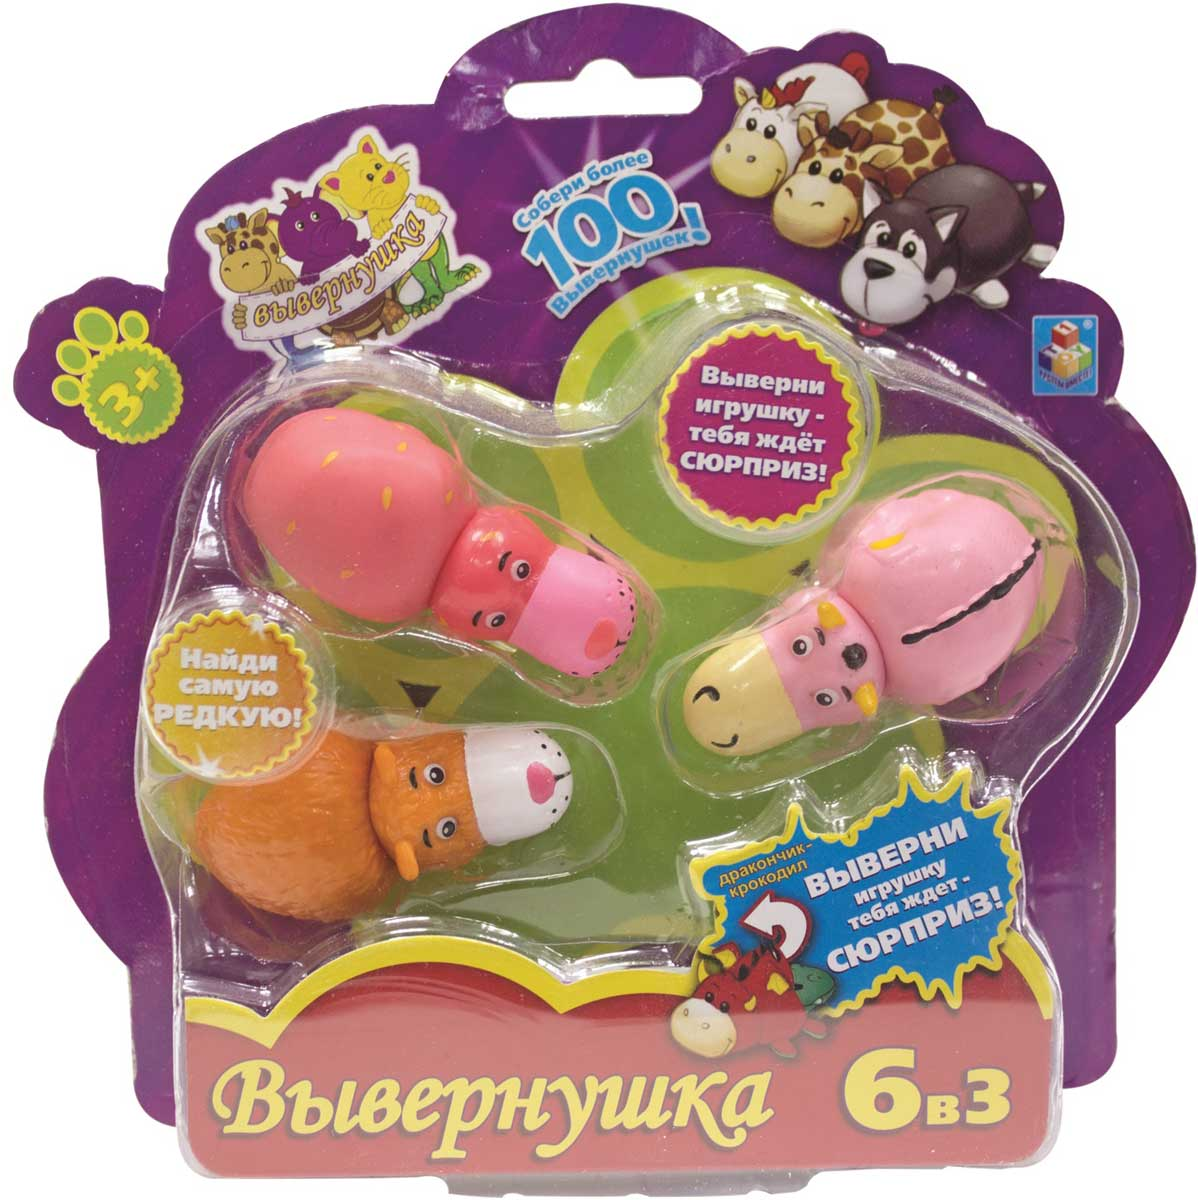 1Toy Фигурка Вывернушка 3 шт большую мягкую игрушку собаку лежа в москве